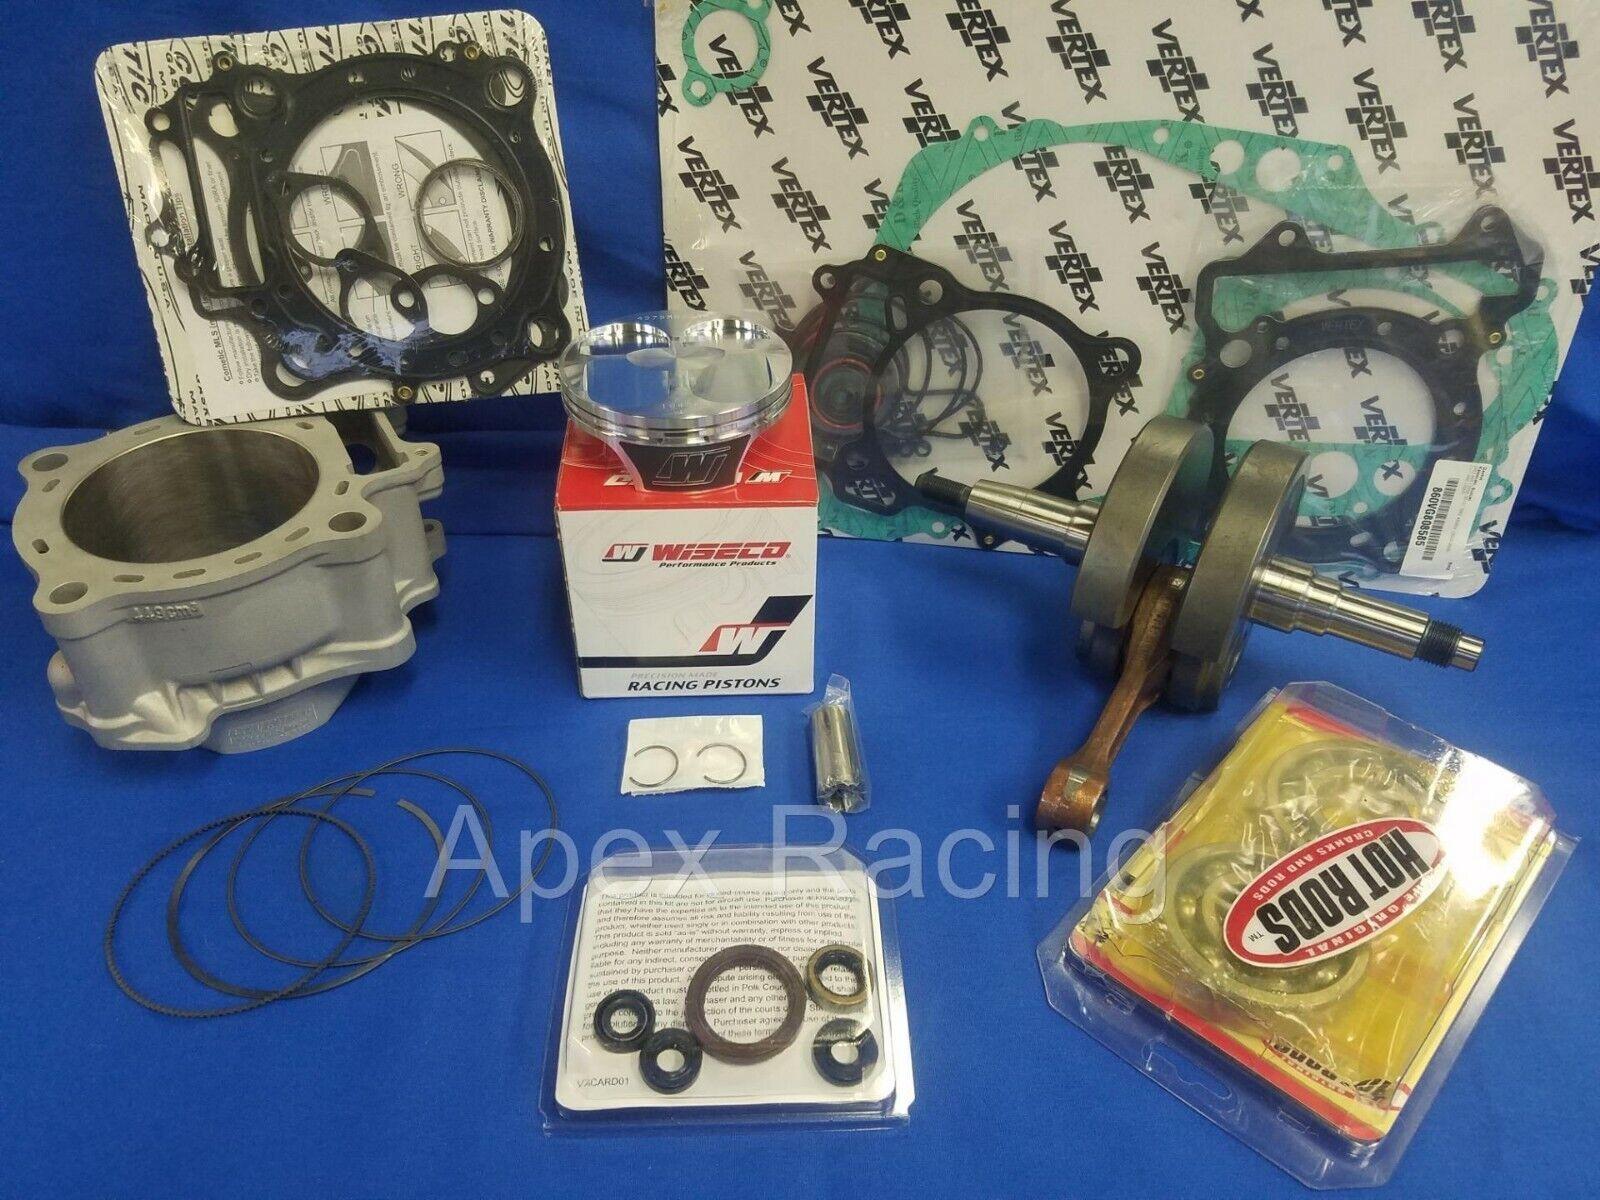 Vertex Top End Piston Kit Standard Bore for KTM 144 SX 2007-2008